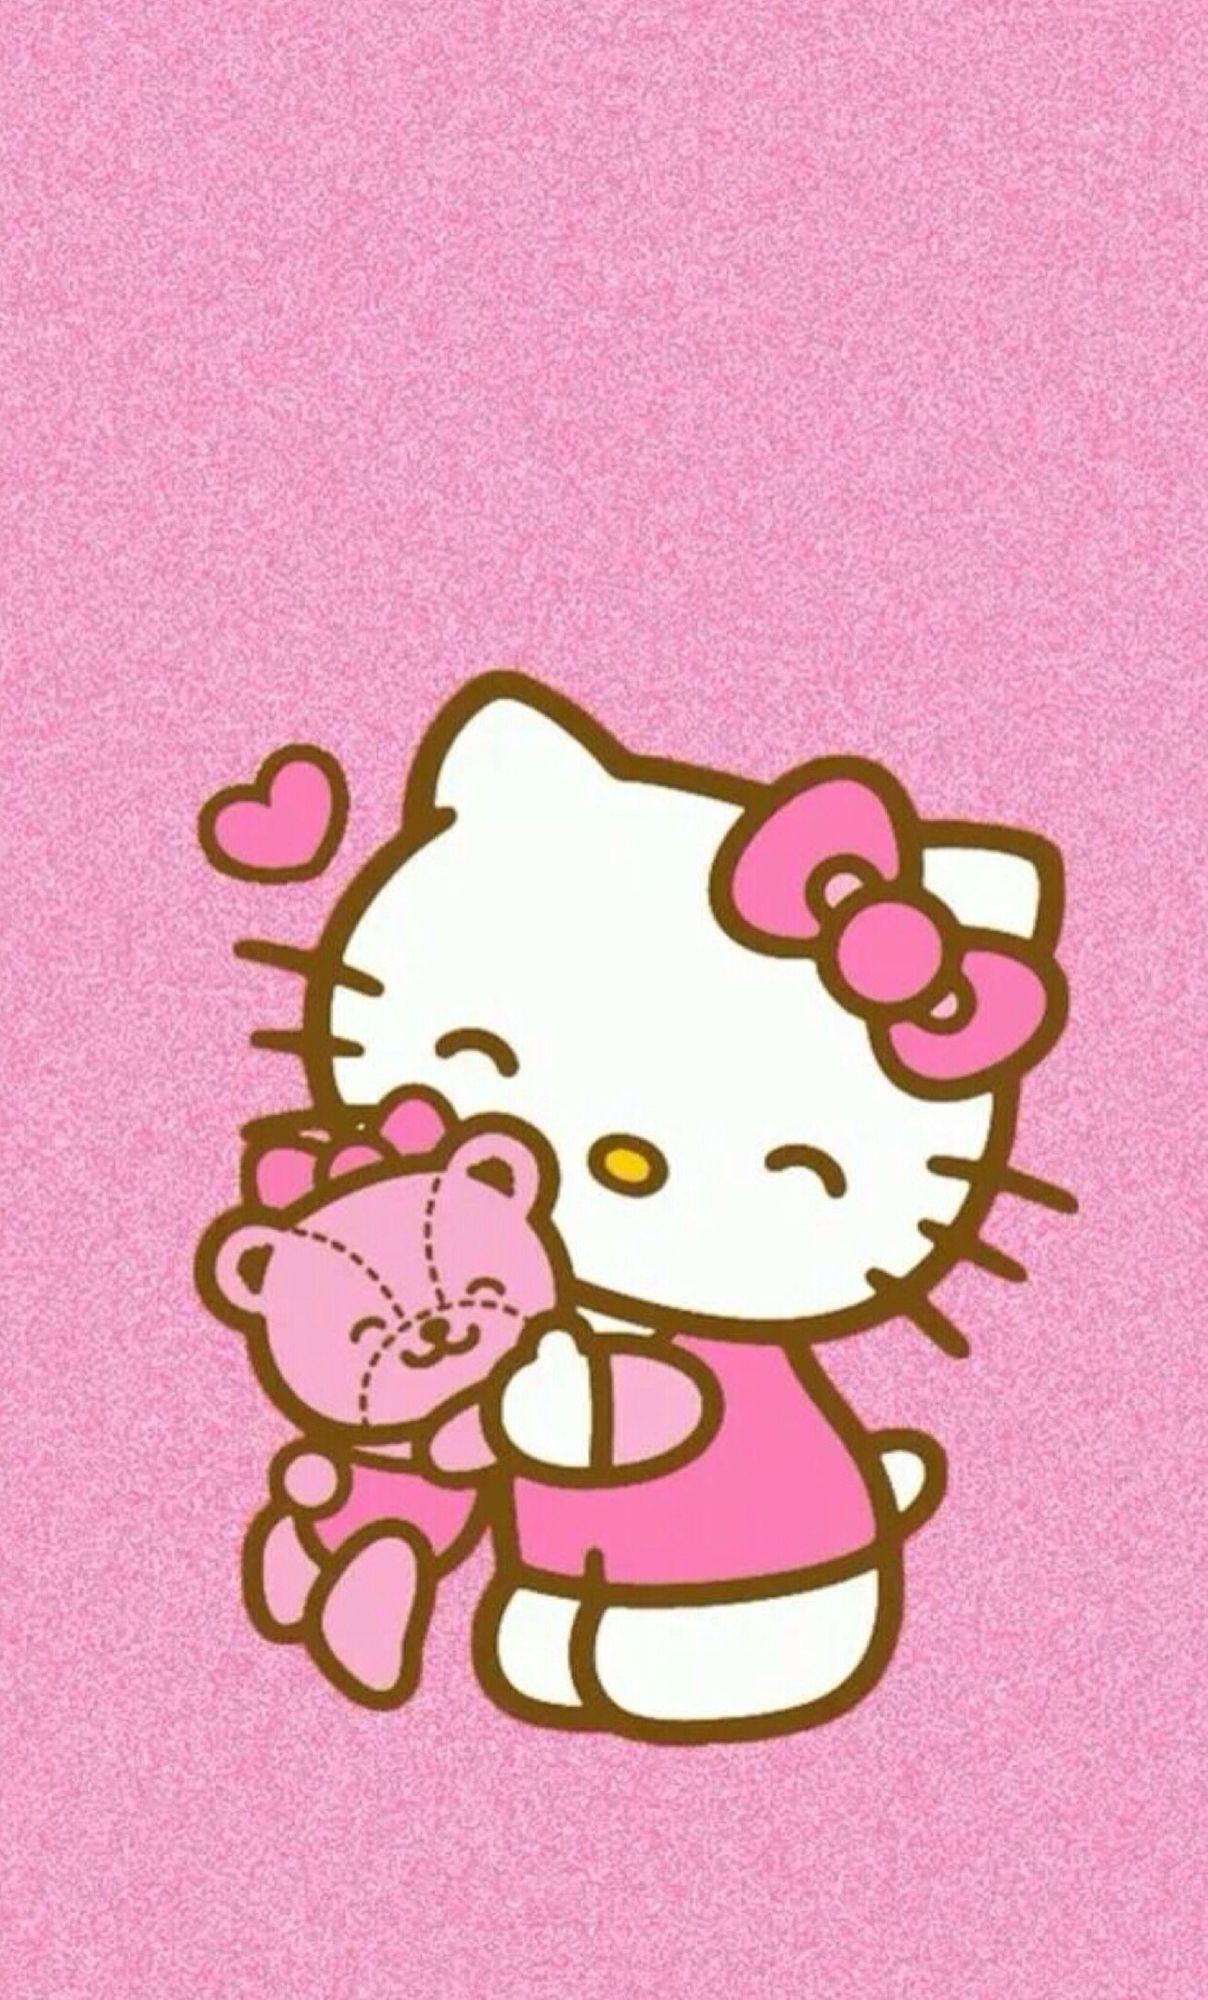 Hello Kitty Wallpaper Hello Kitty Pictures Hello Kitty